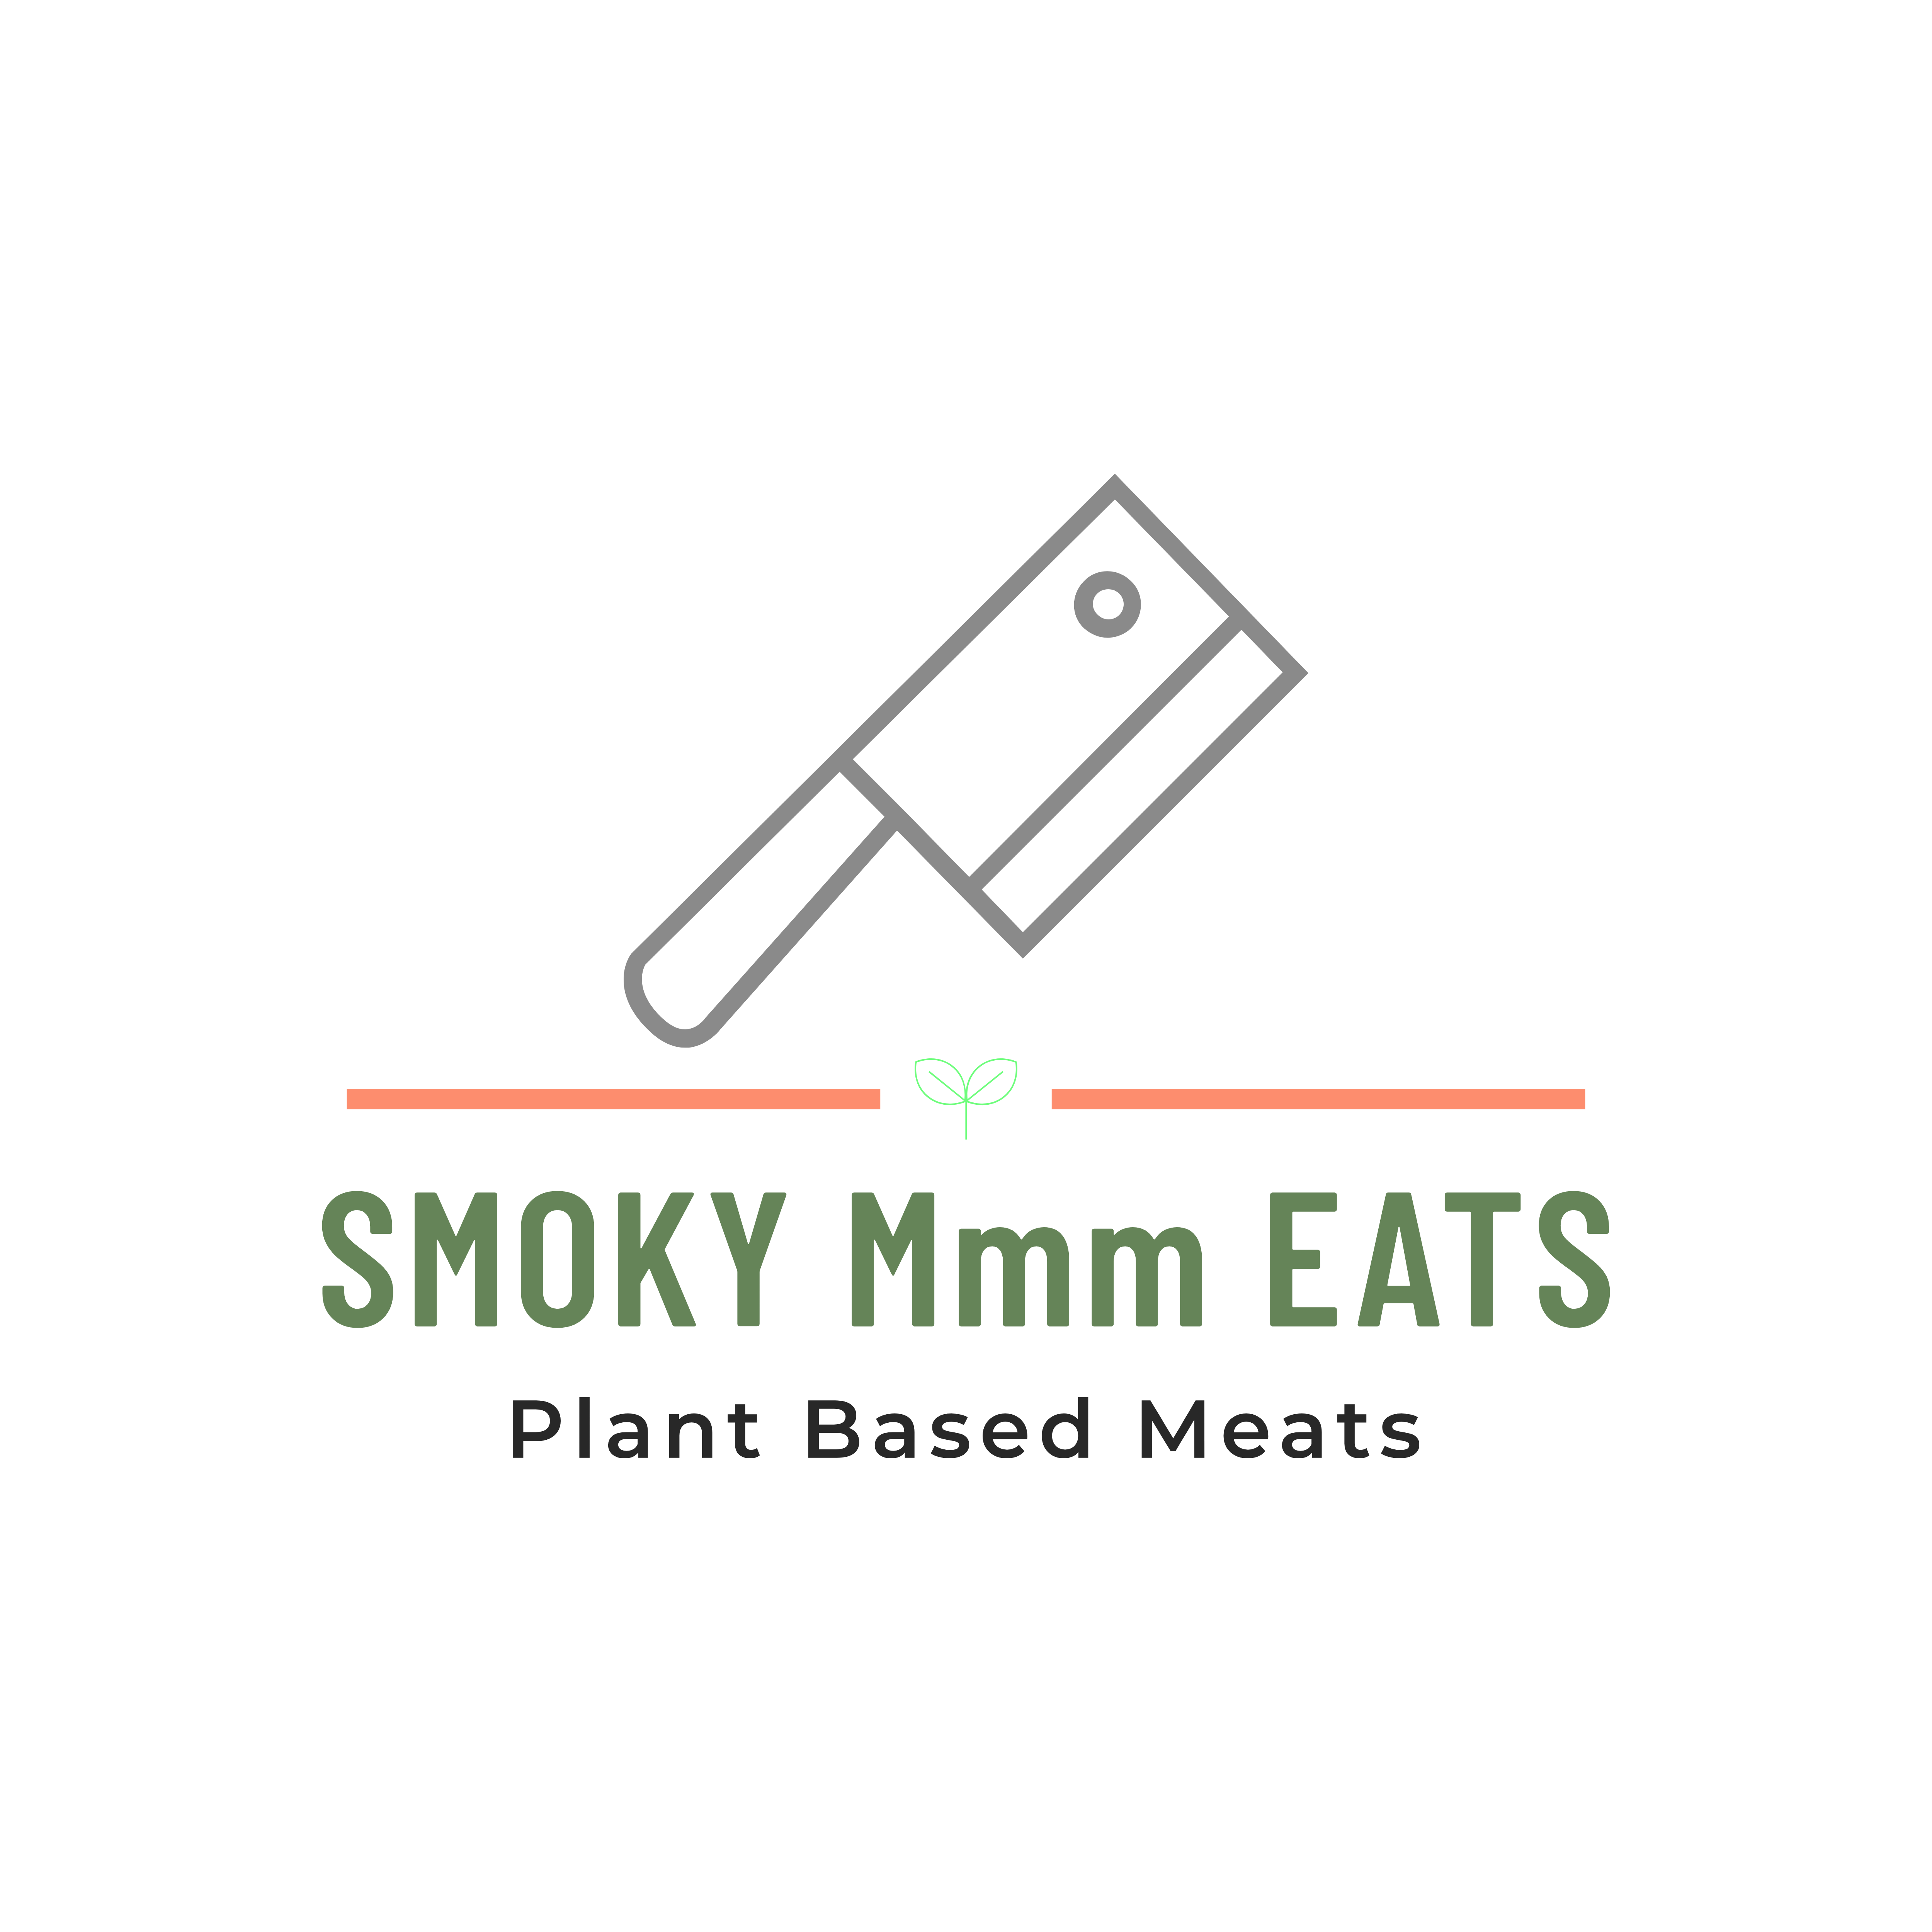 Smoky Mmm Eats logo.png